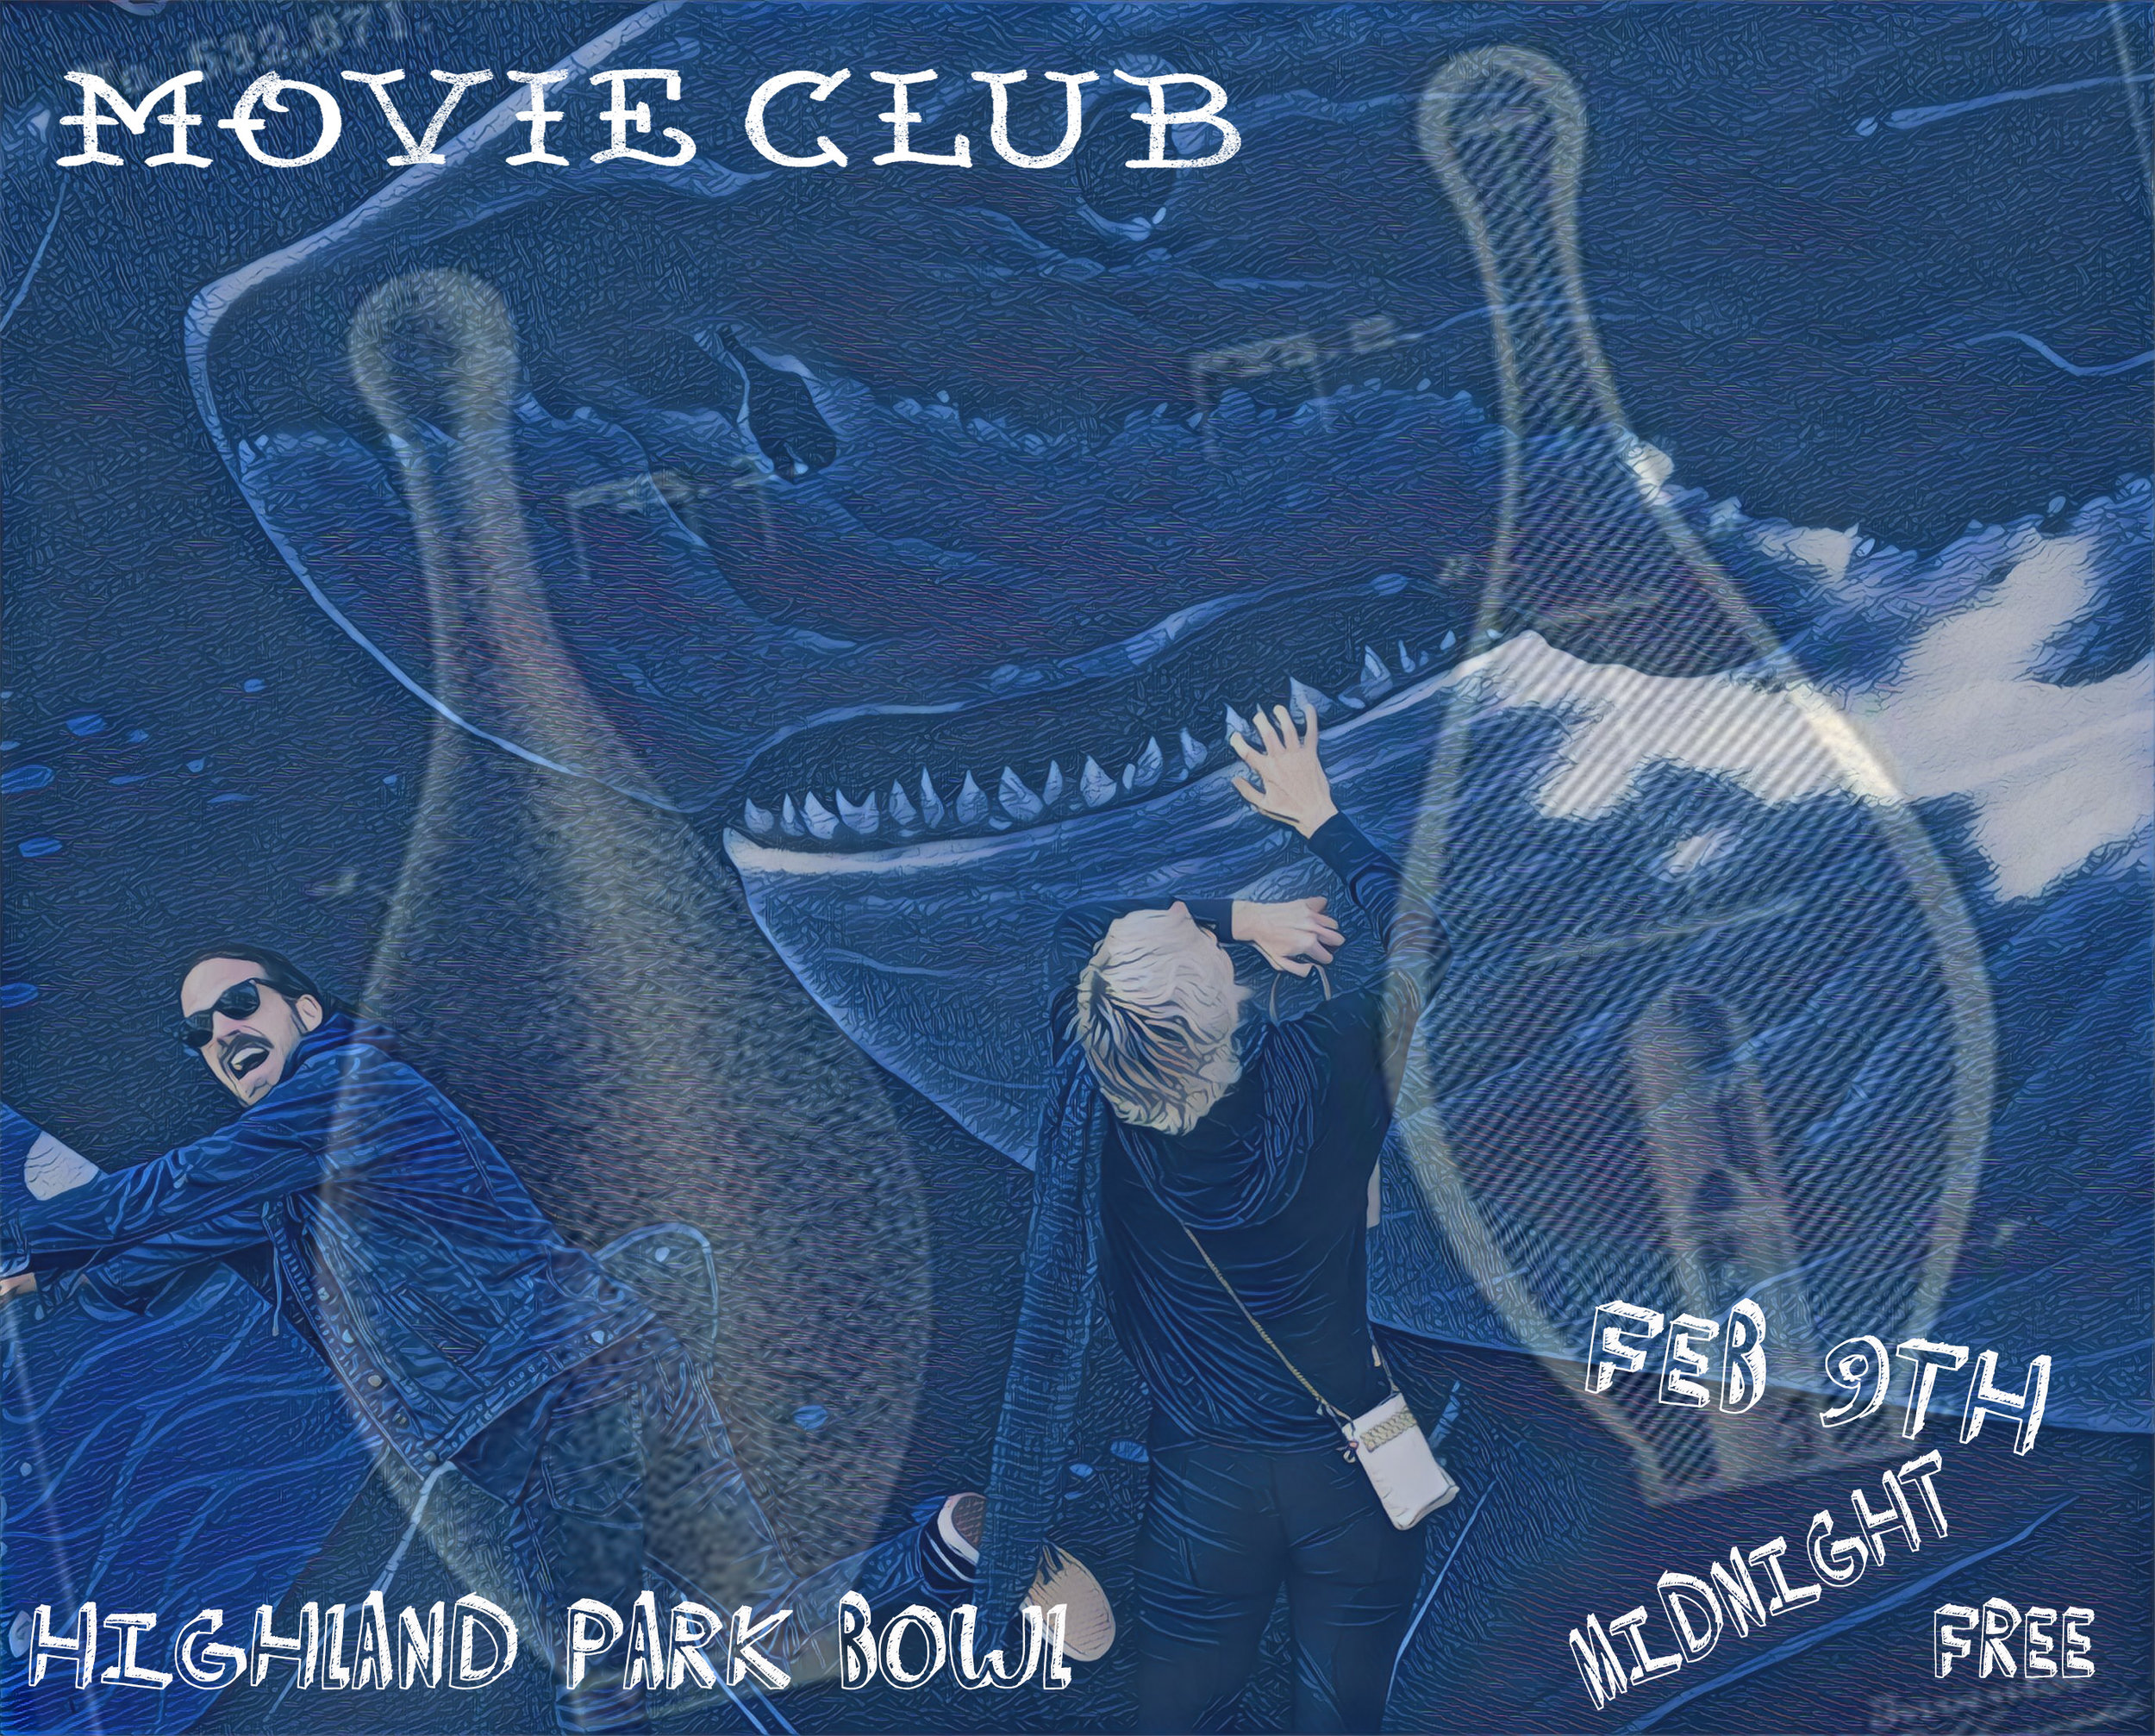 Saturday, Feb. 9th - Movie Club live at midnight at Highland Park Bowl! Free show!